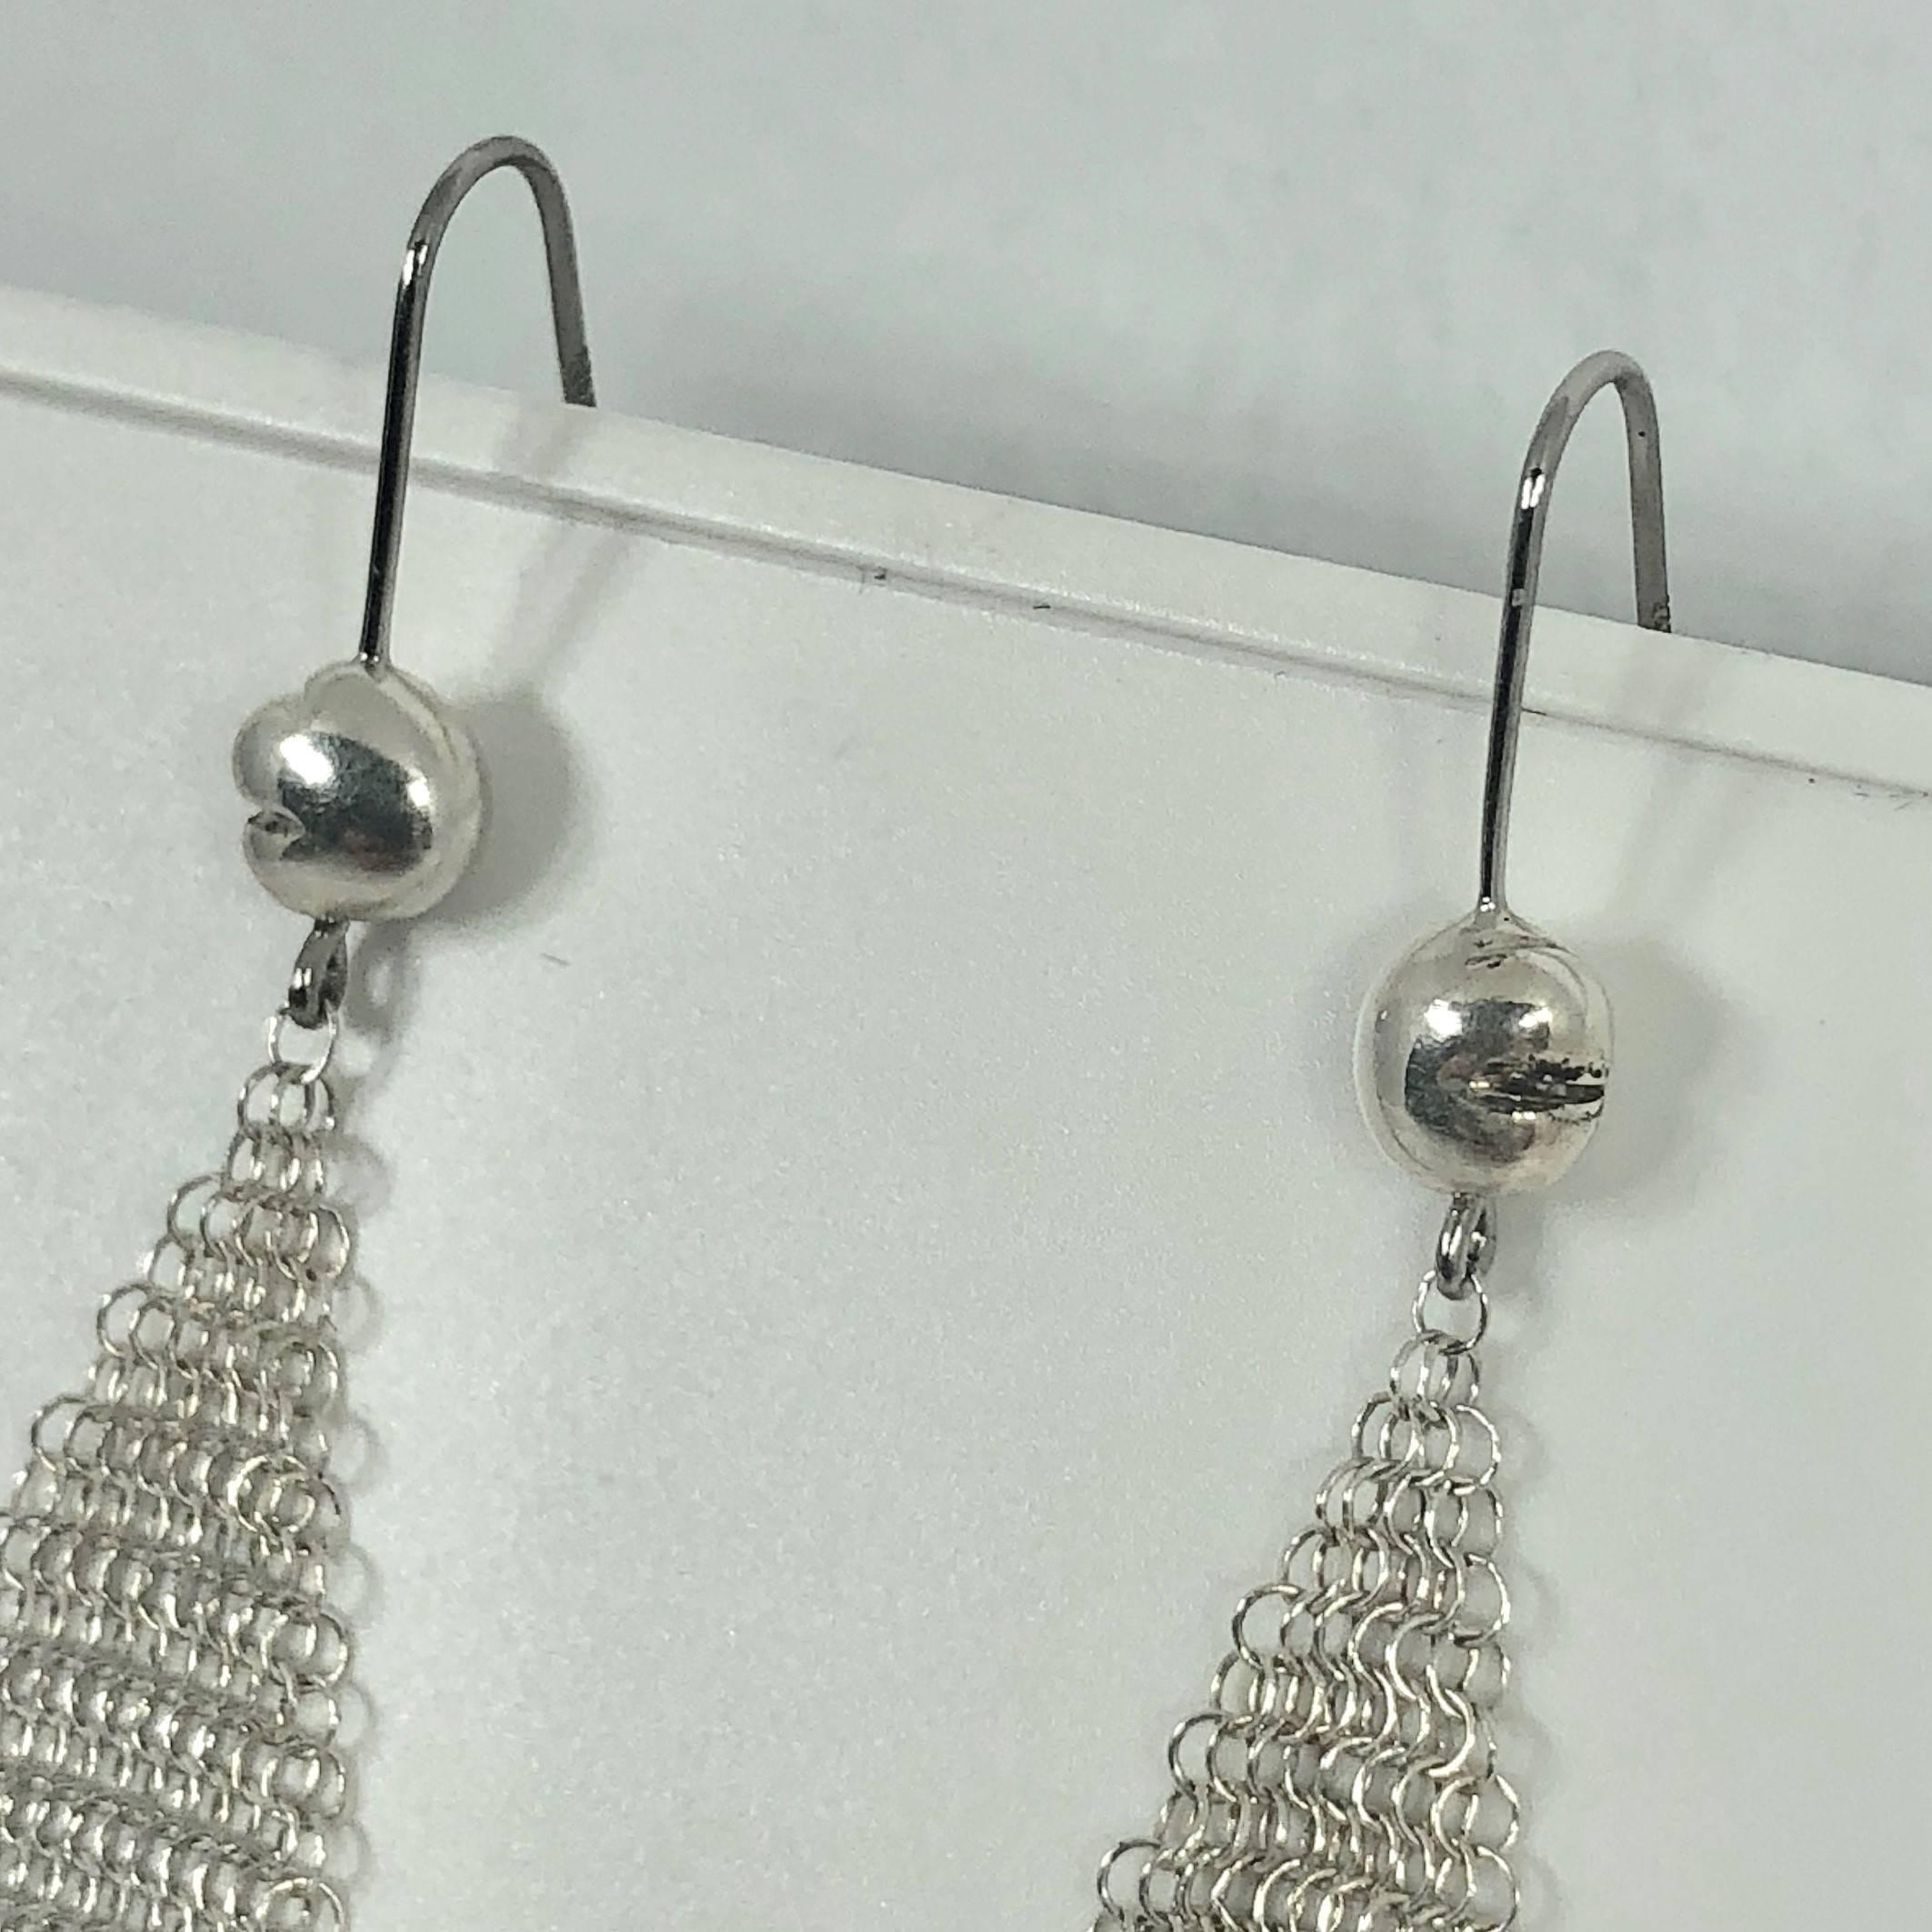 d0a5eb28e Tiffany and Co. Elsa Peretti Sterling Silver Mesh Handkerchief Earrings at  1stdibs